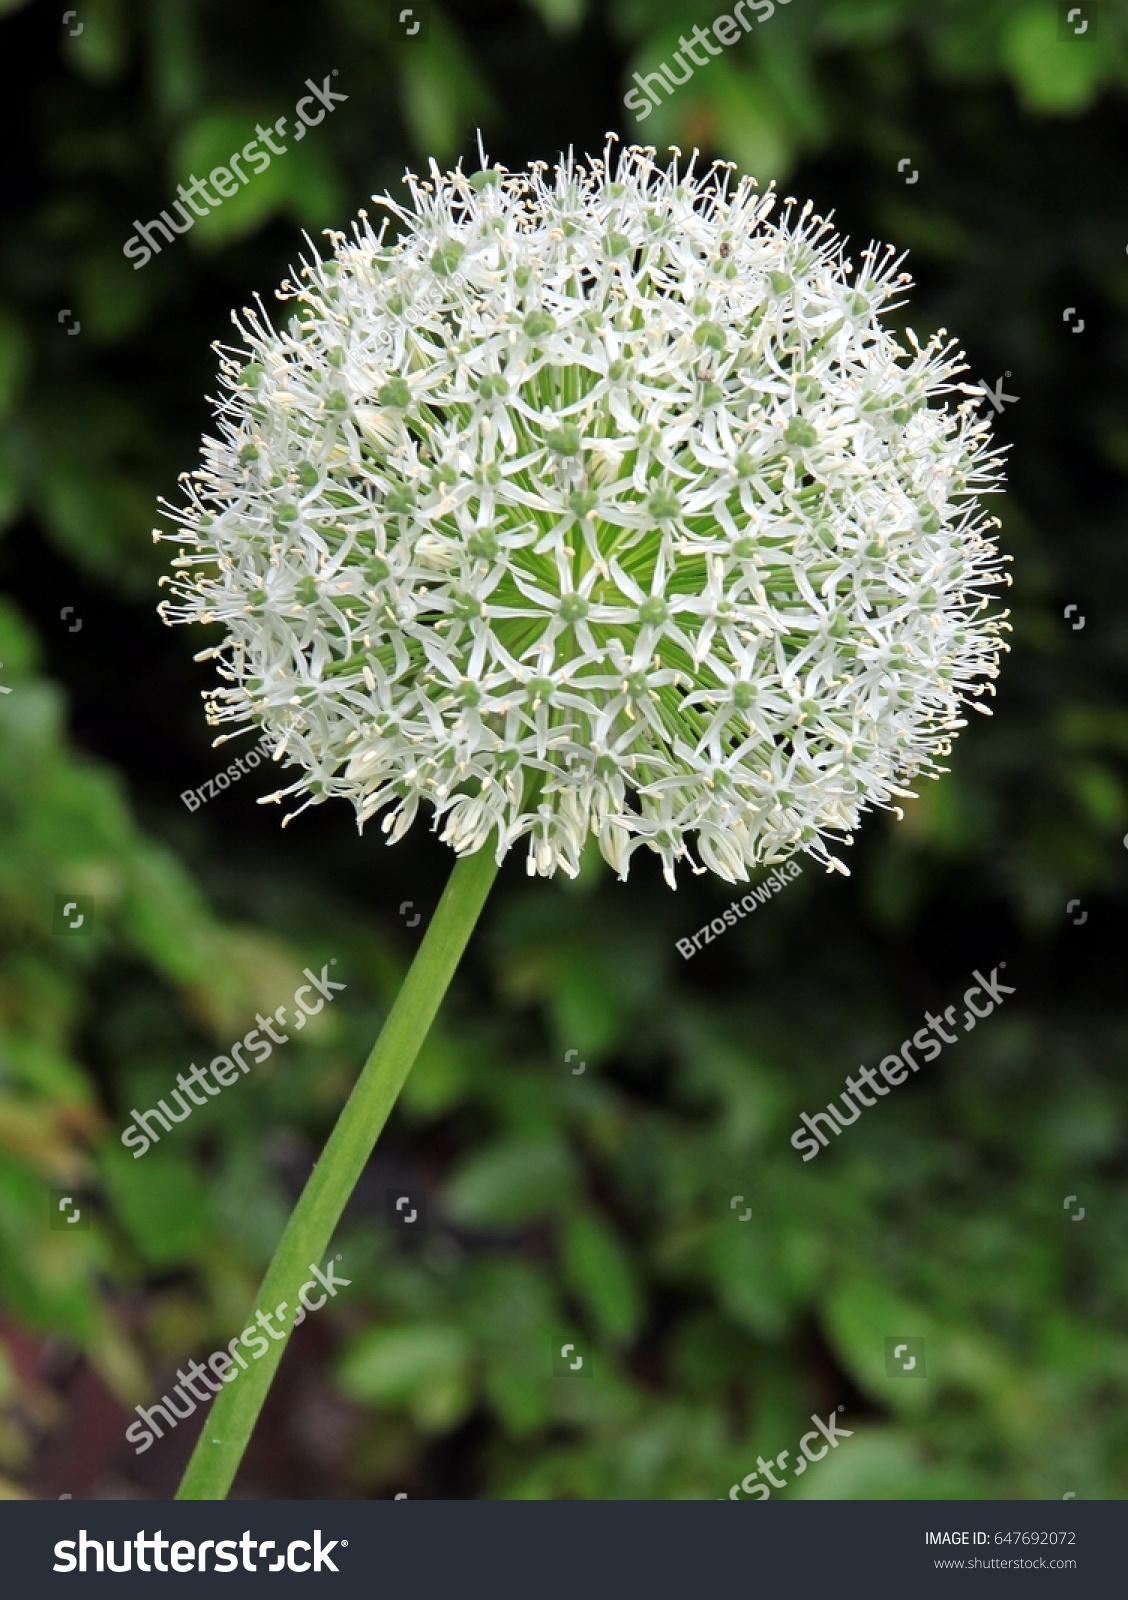 Alium Giganteum Plant White Flower Stock Photo Edit Now 647692072